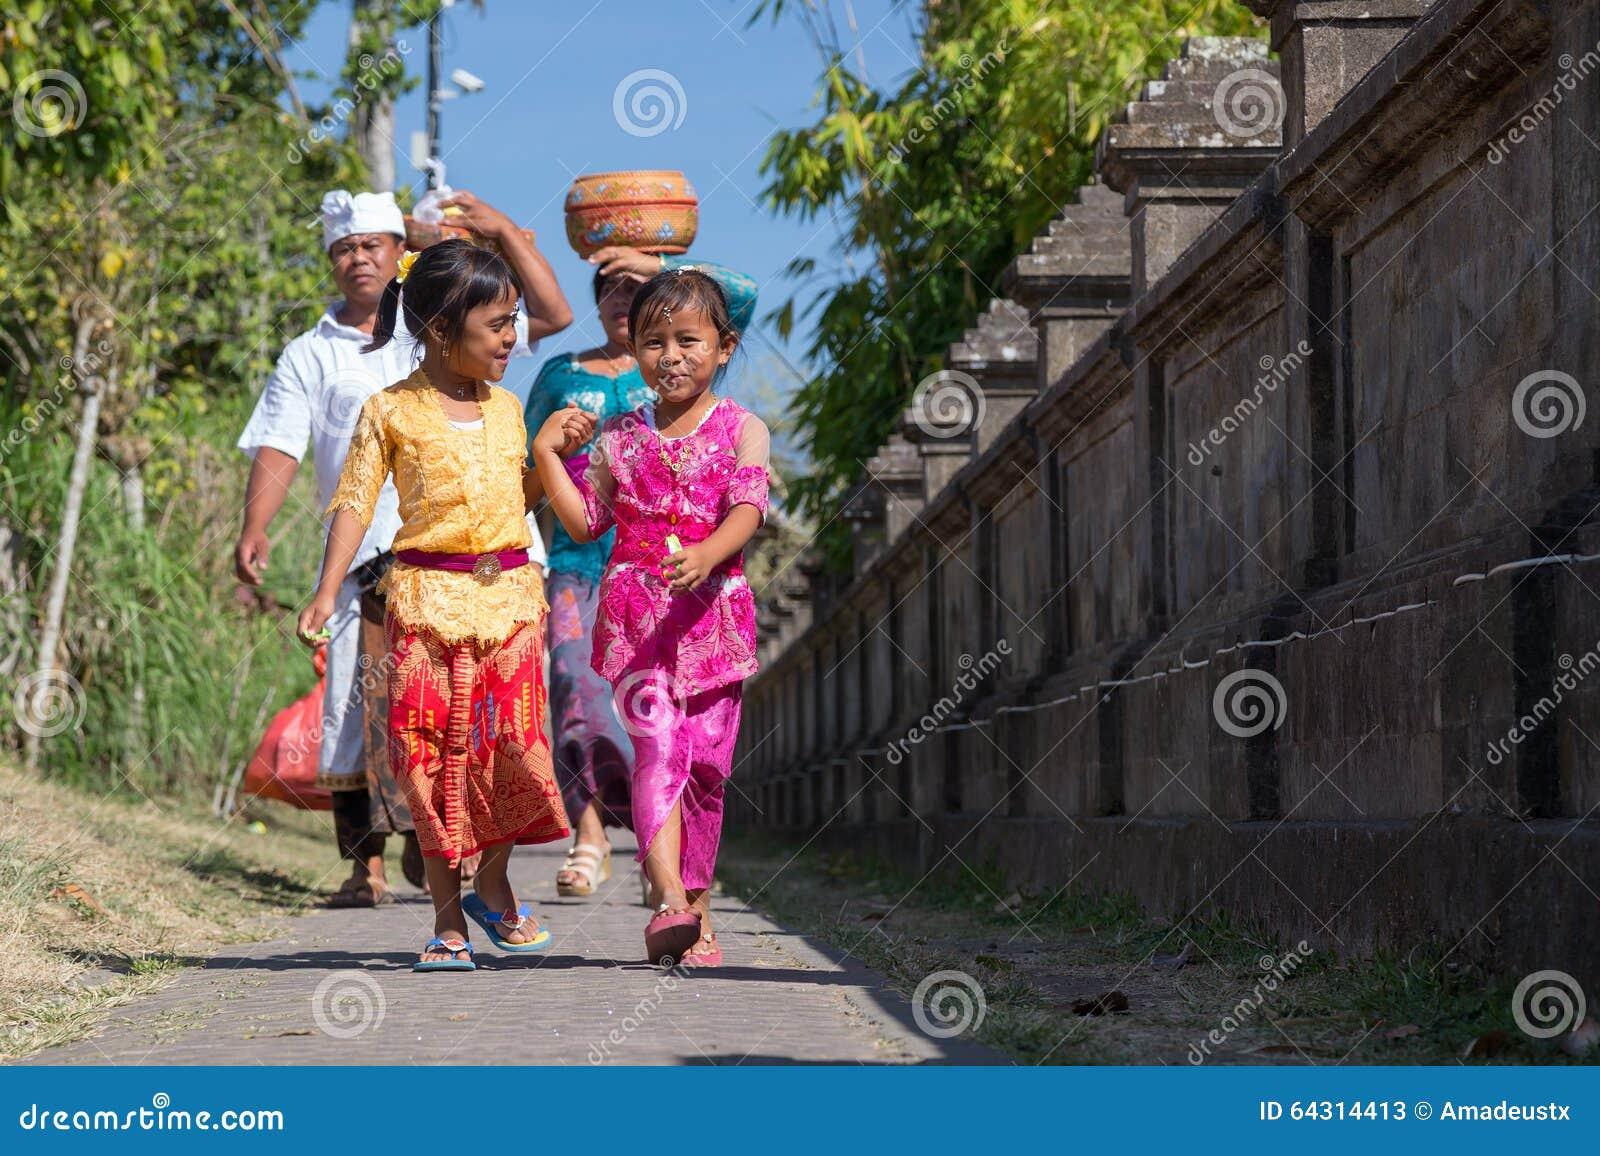 Village of Besakih, Bali/Indonesia - circa October 2015: Happy family are coming back from festival in Pura Besakih